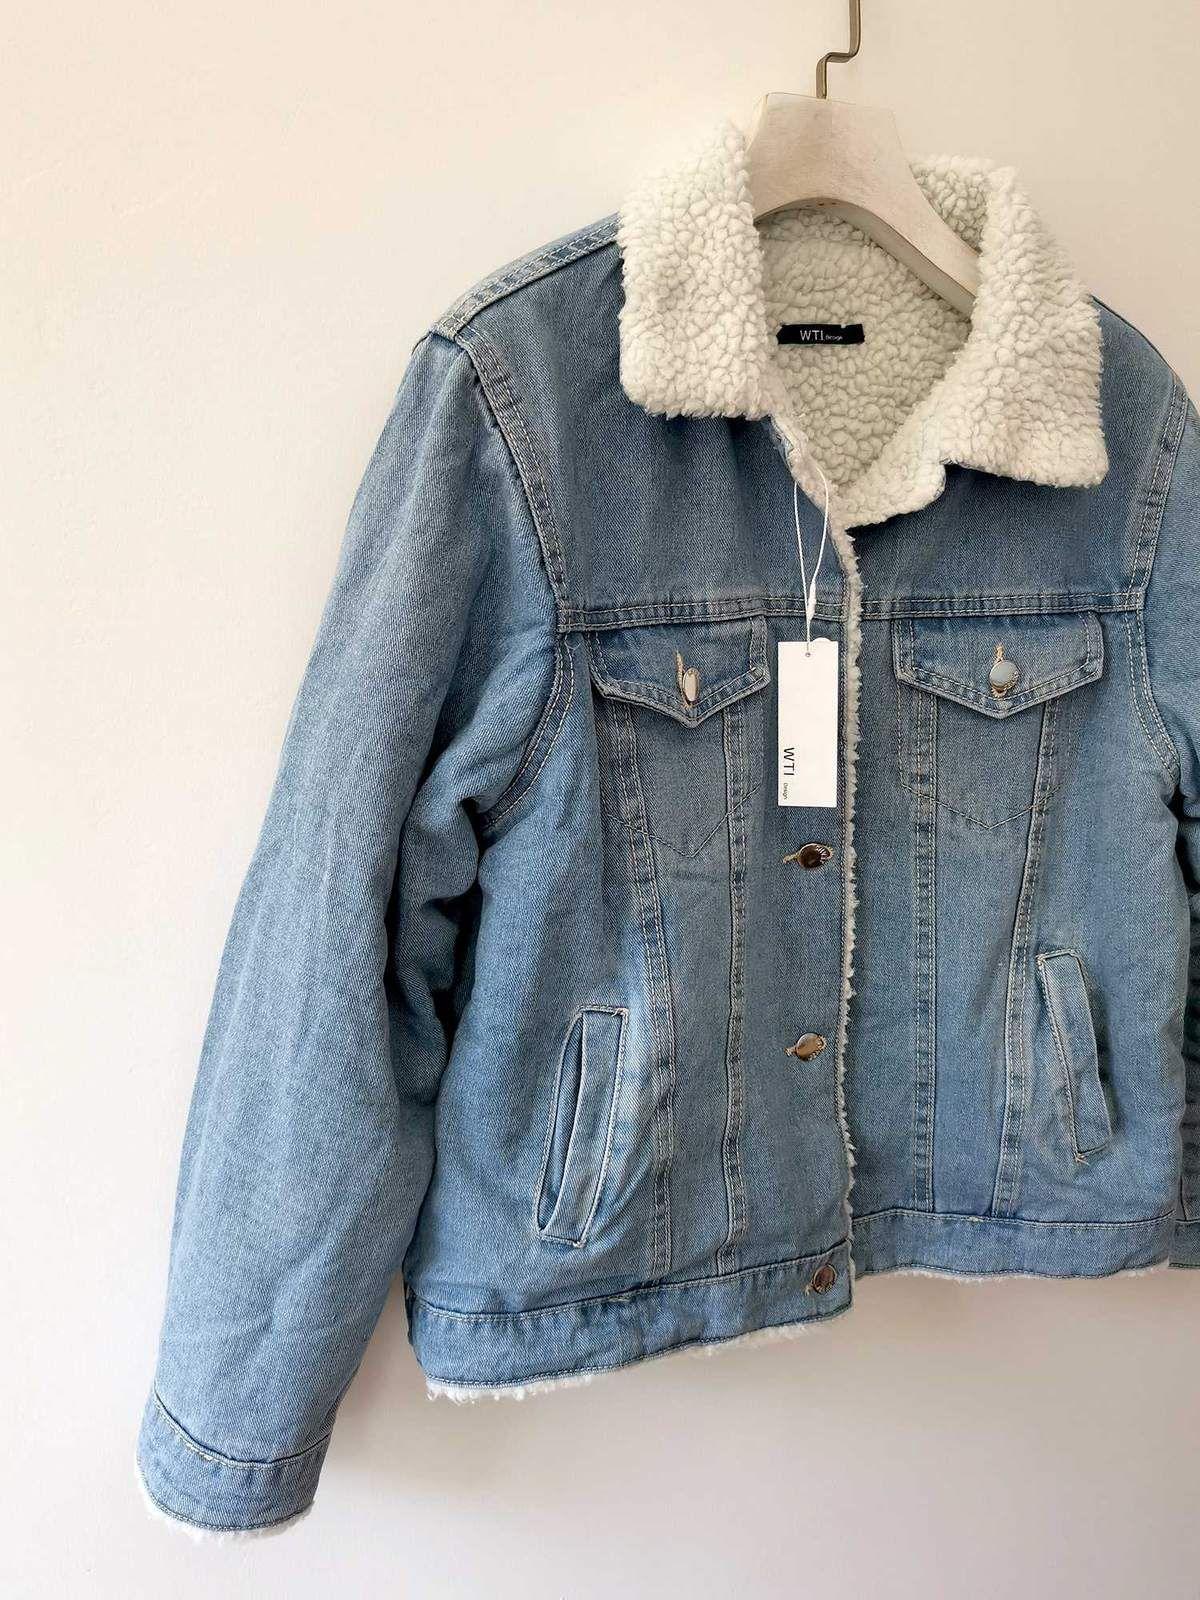 Classic Denim Sherpa Jacket W T I Design Jacket Outfit Women Fleece Denim Jacket Lined Denim Jacket [ 1600 x 1200 Pixel ]